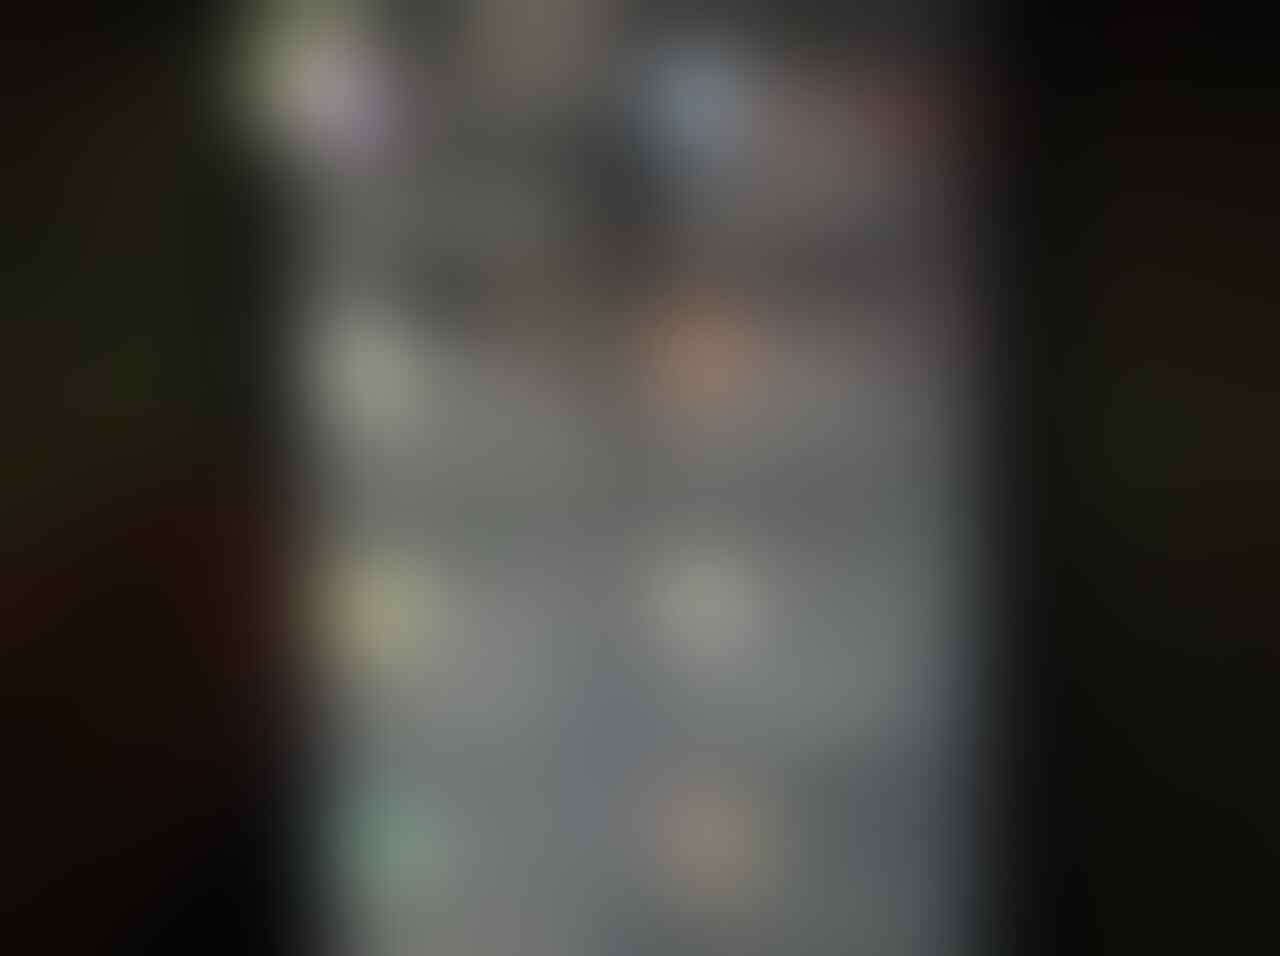 [Lounge] Sony Xperia™ Z1 - Part 1